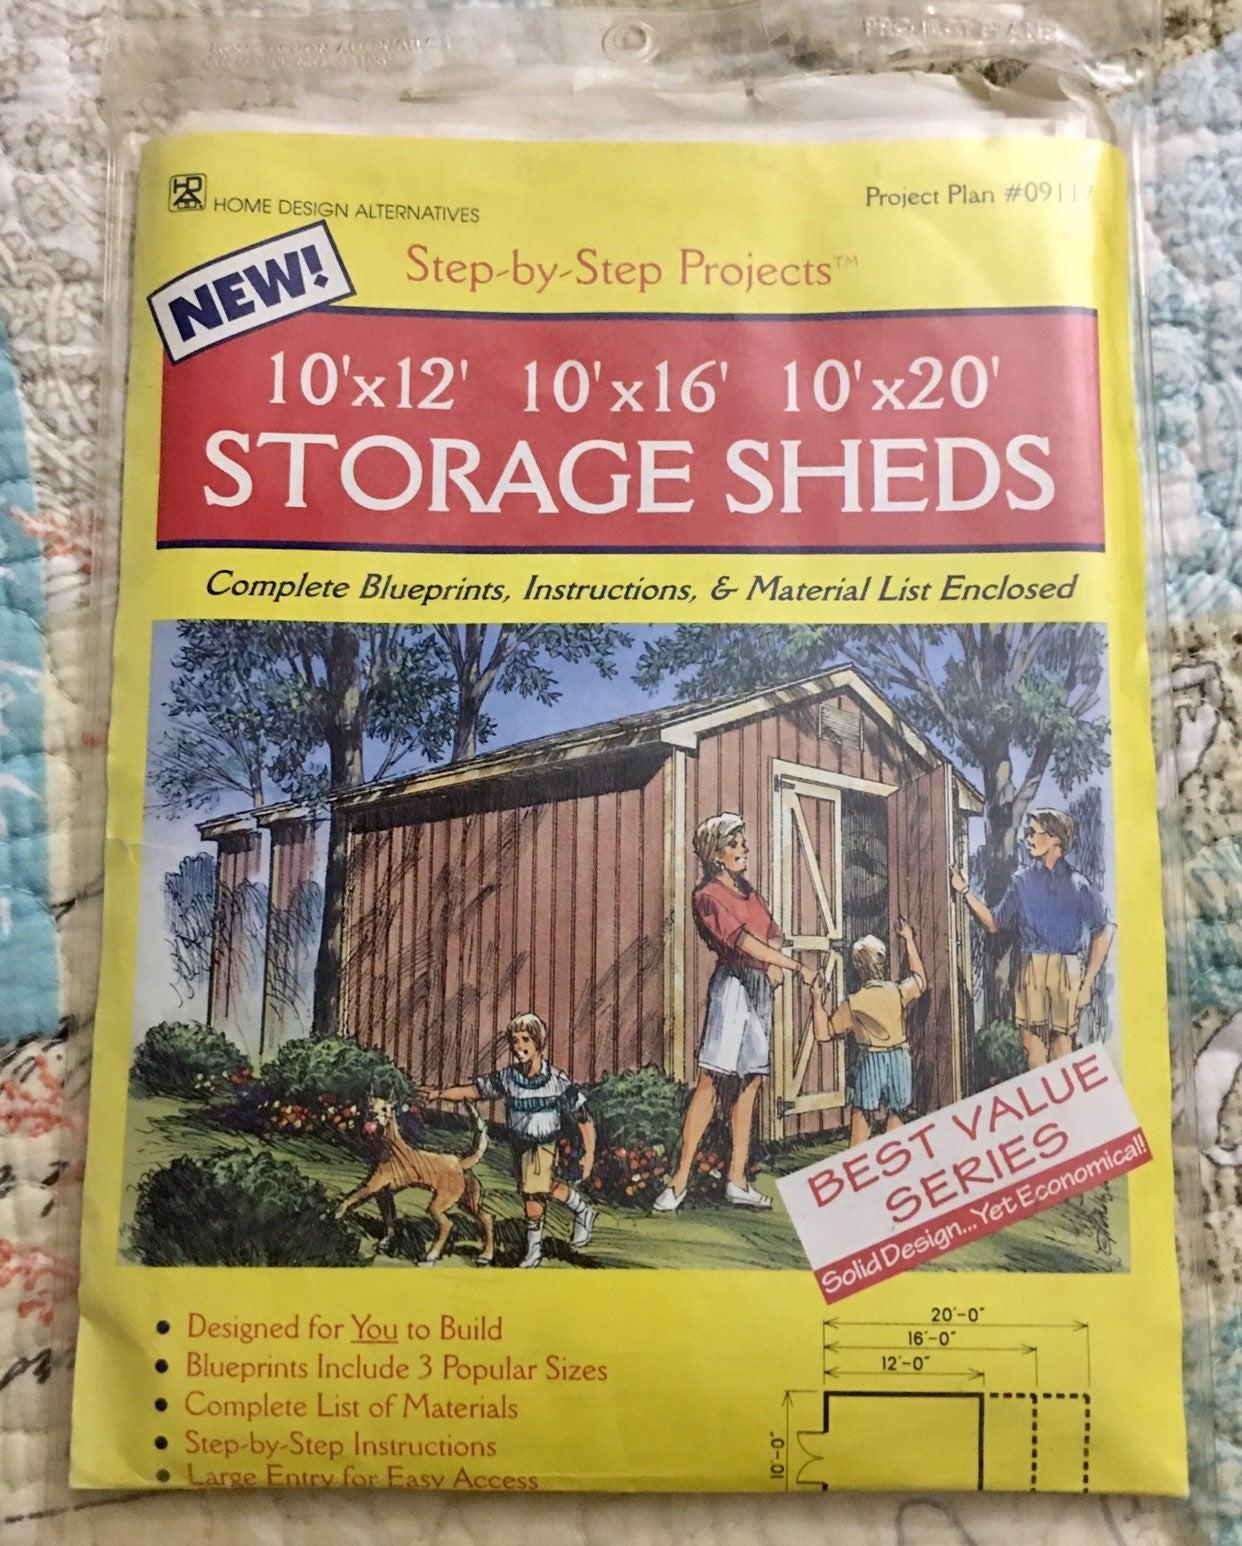 Storage Plans by Home Design Alternative